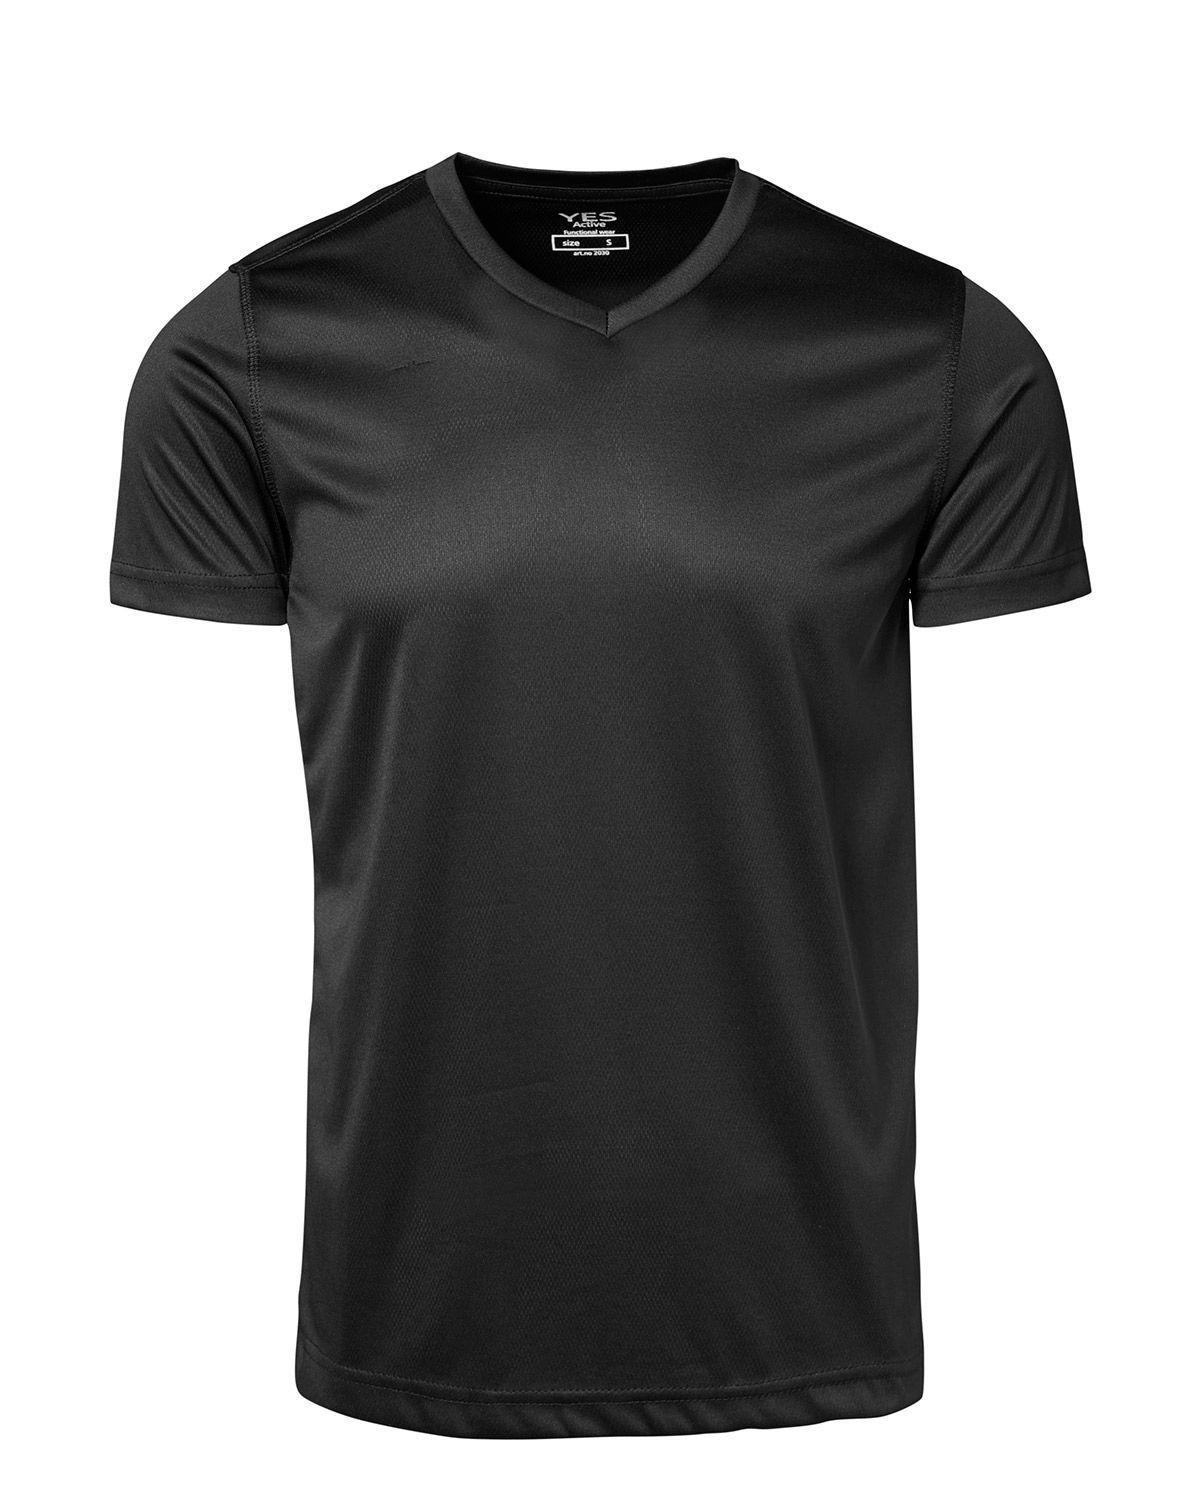 ID YES Svedtransporterende T-shirt (Sort, 2XL)